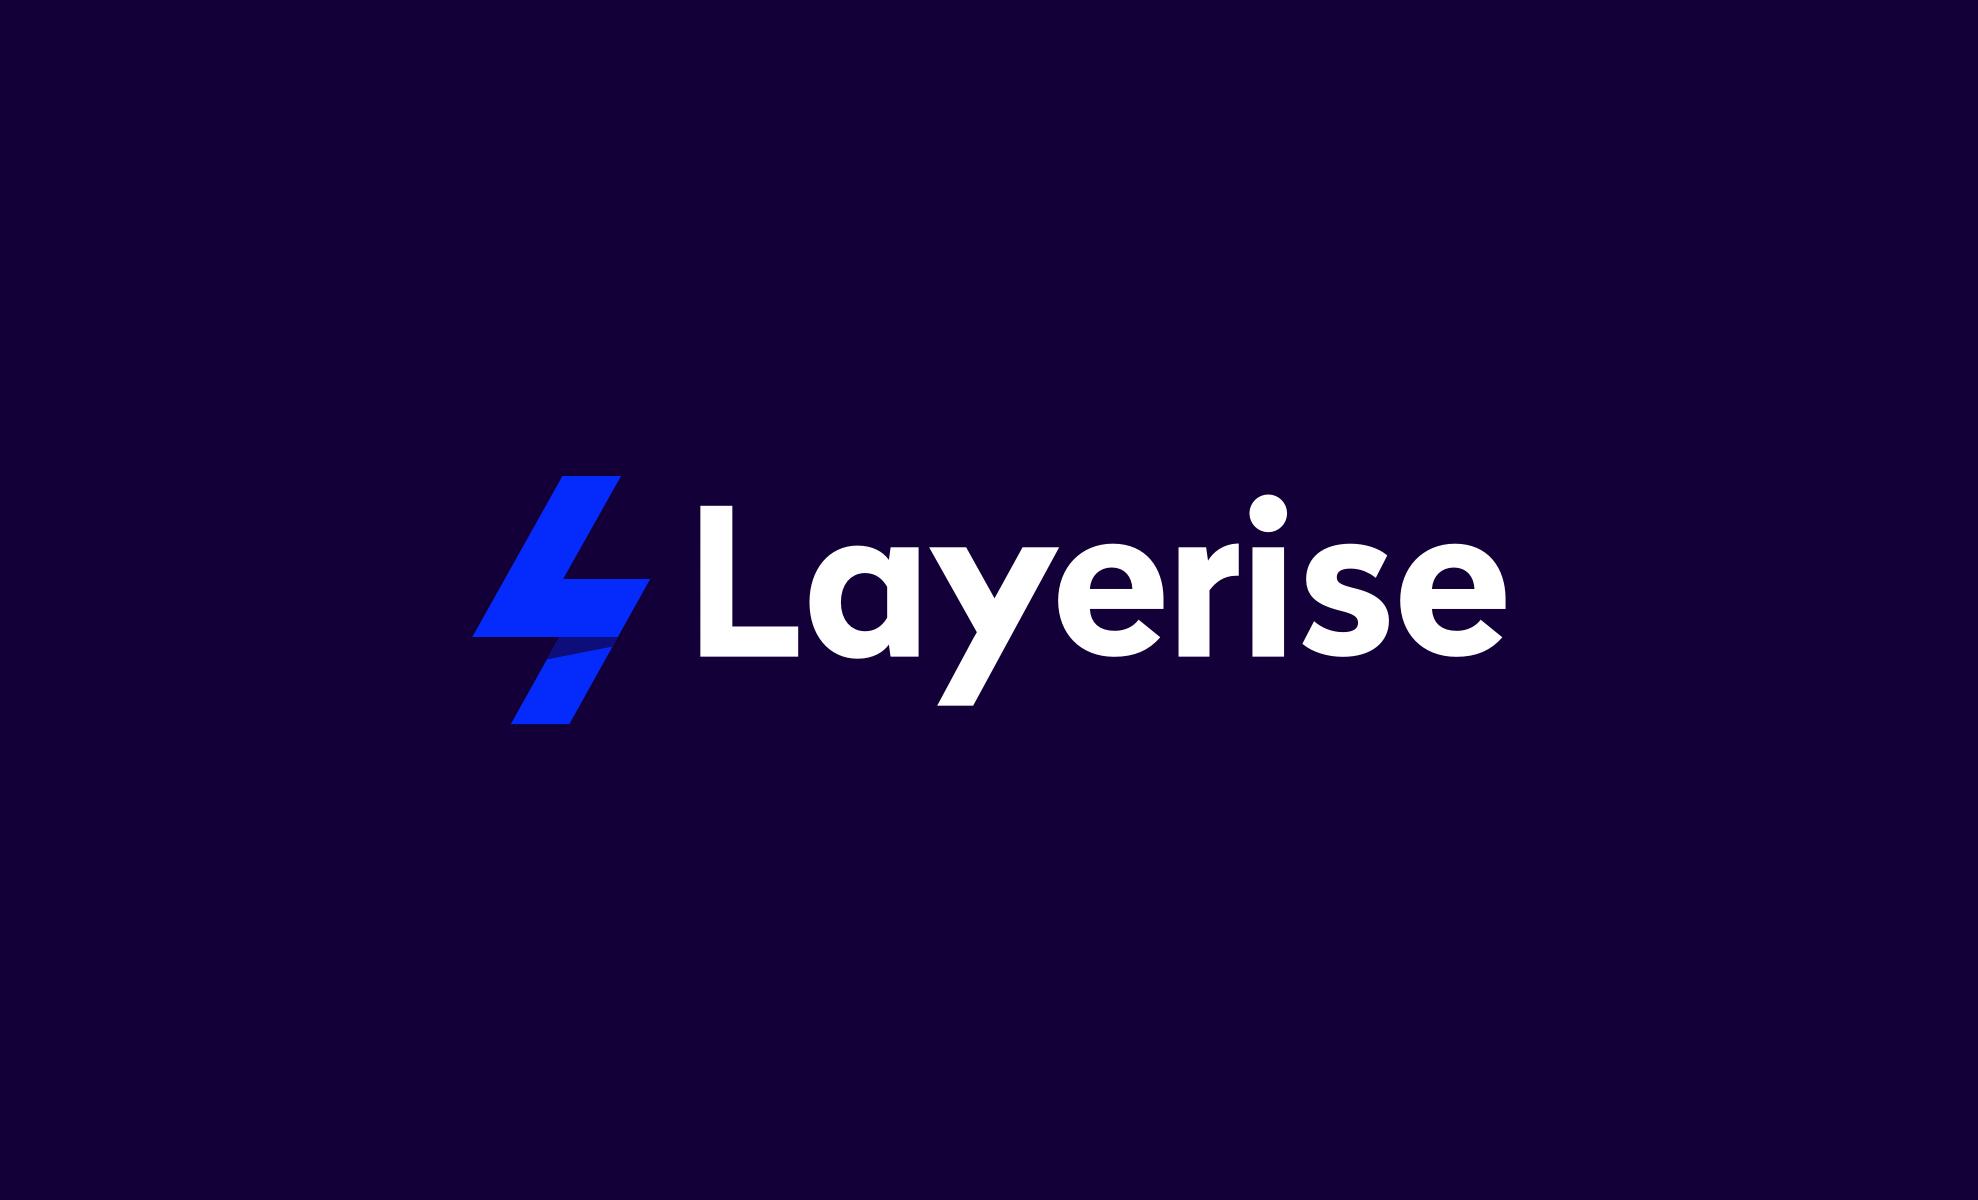 Evolving the Layerise Identity